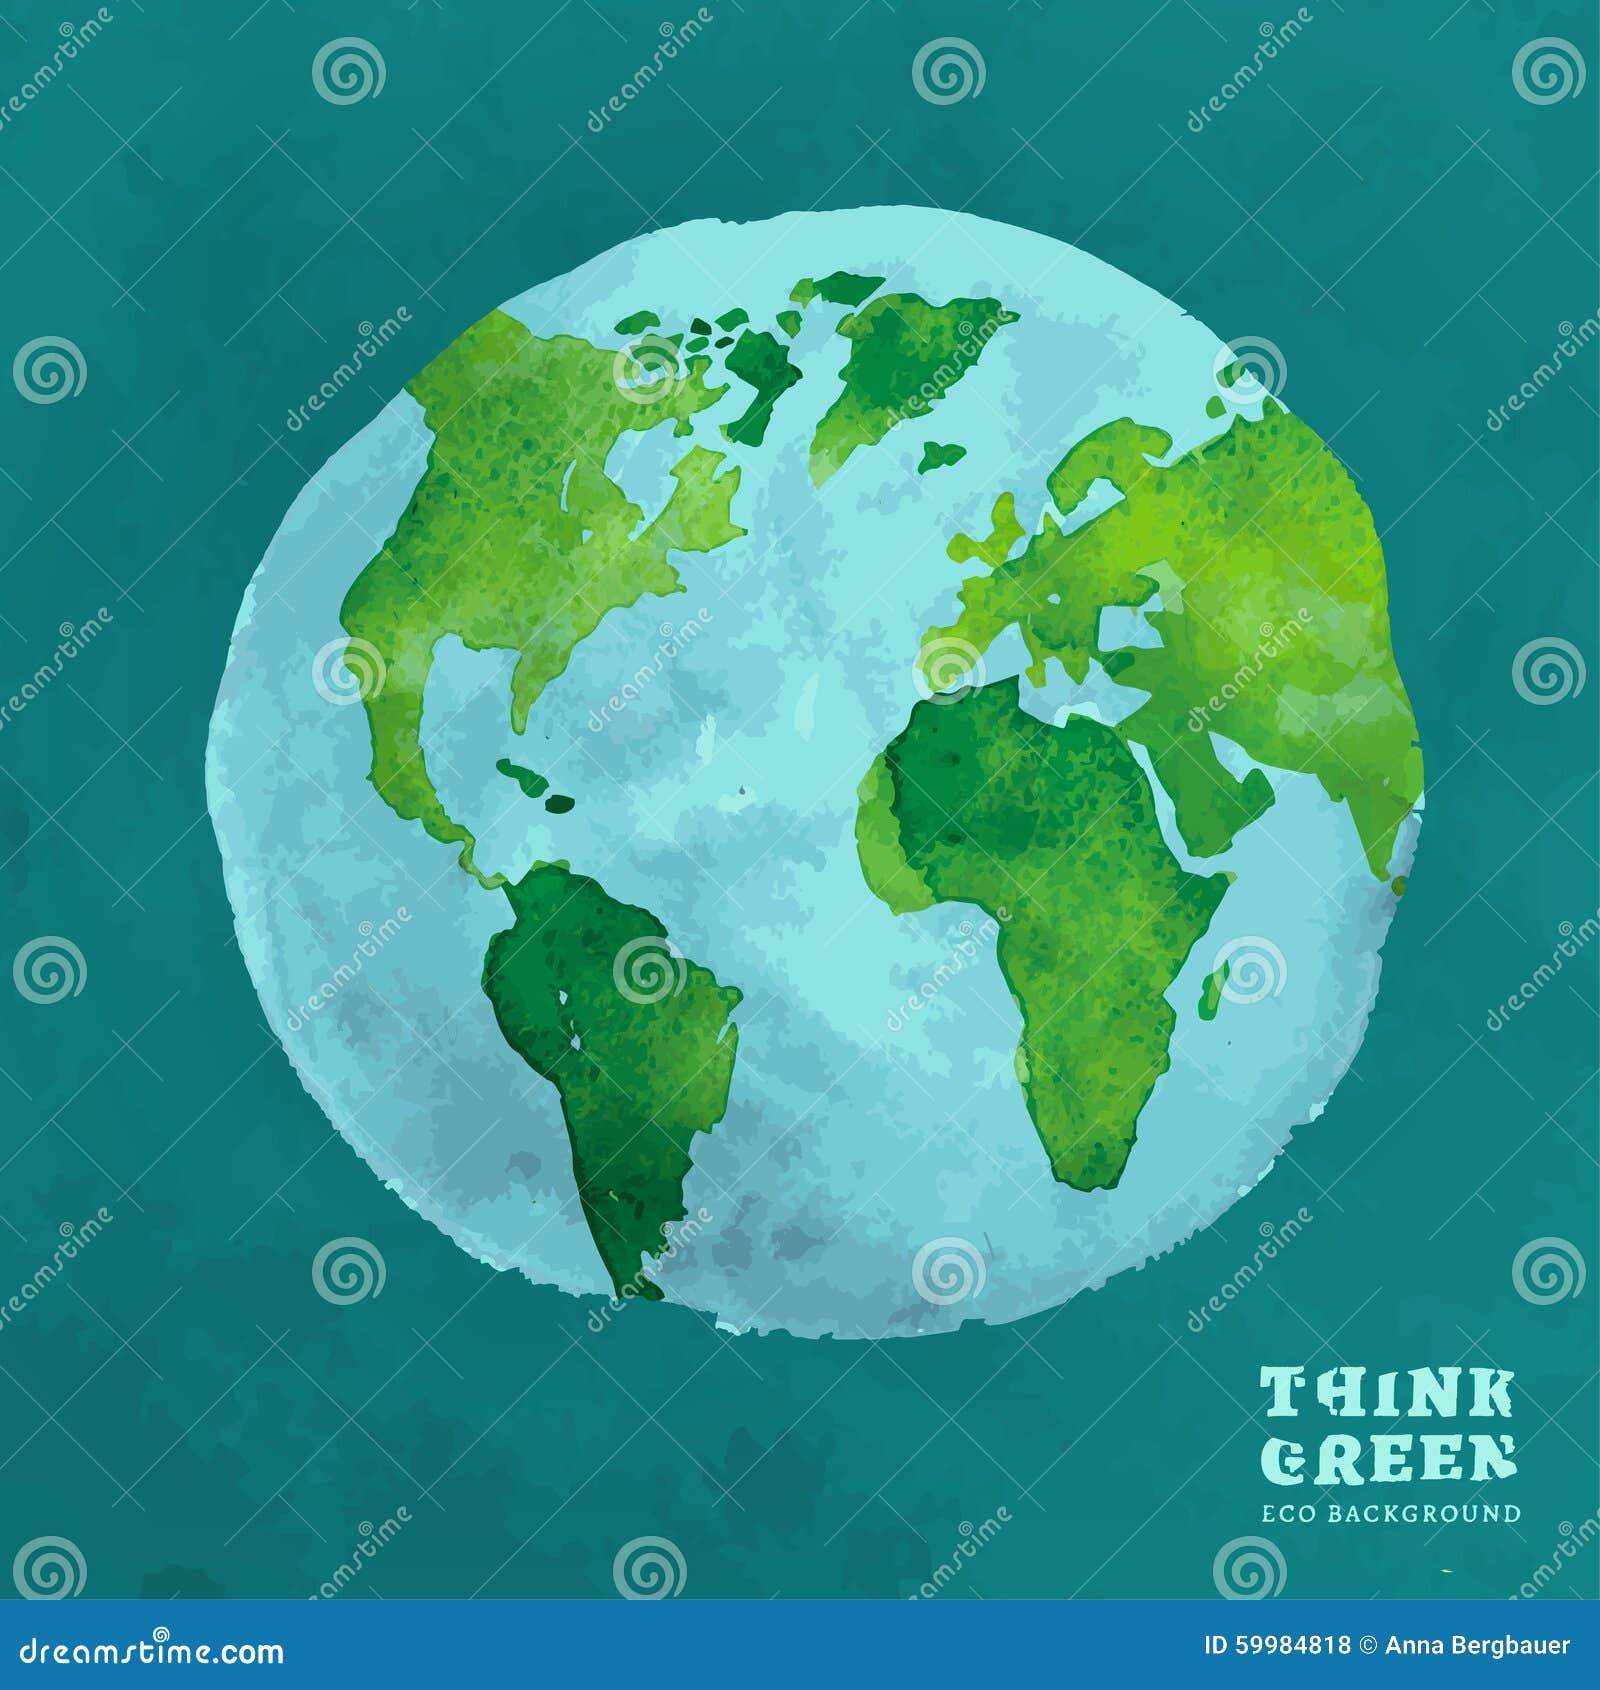 Environmental Concept Earthfriendly Landscapes: 01 Globe Watercolor Eco Concept Stock Vector